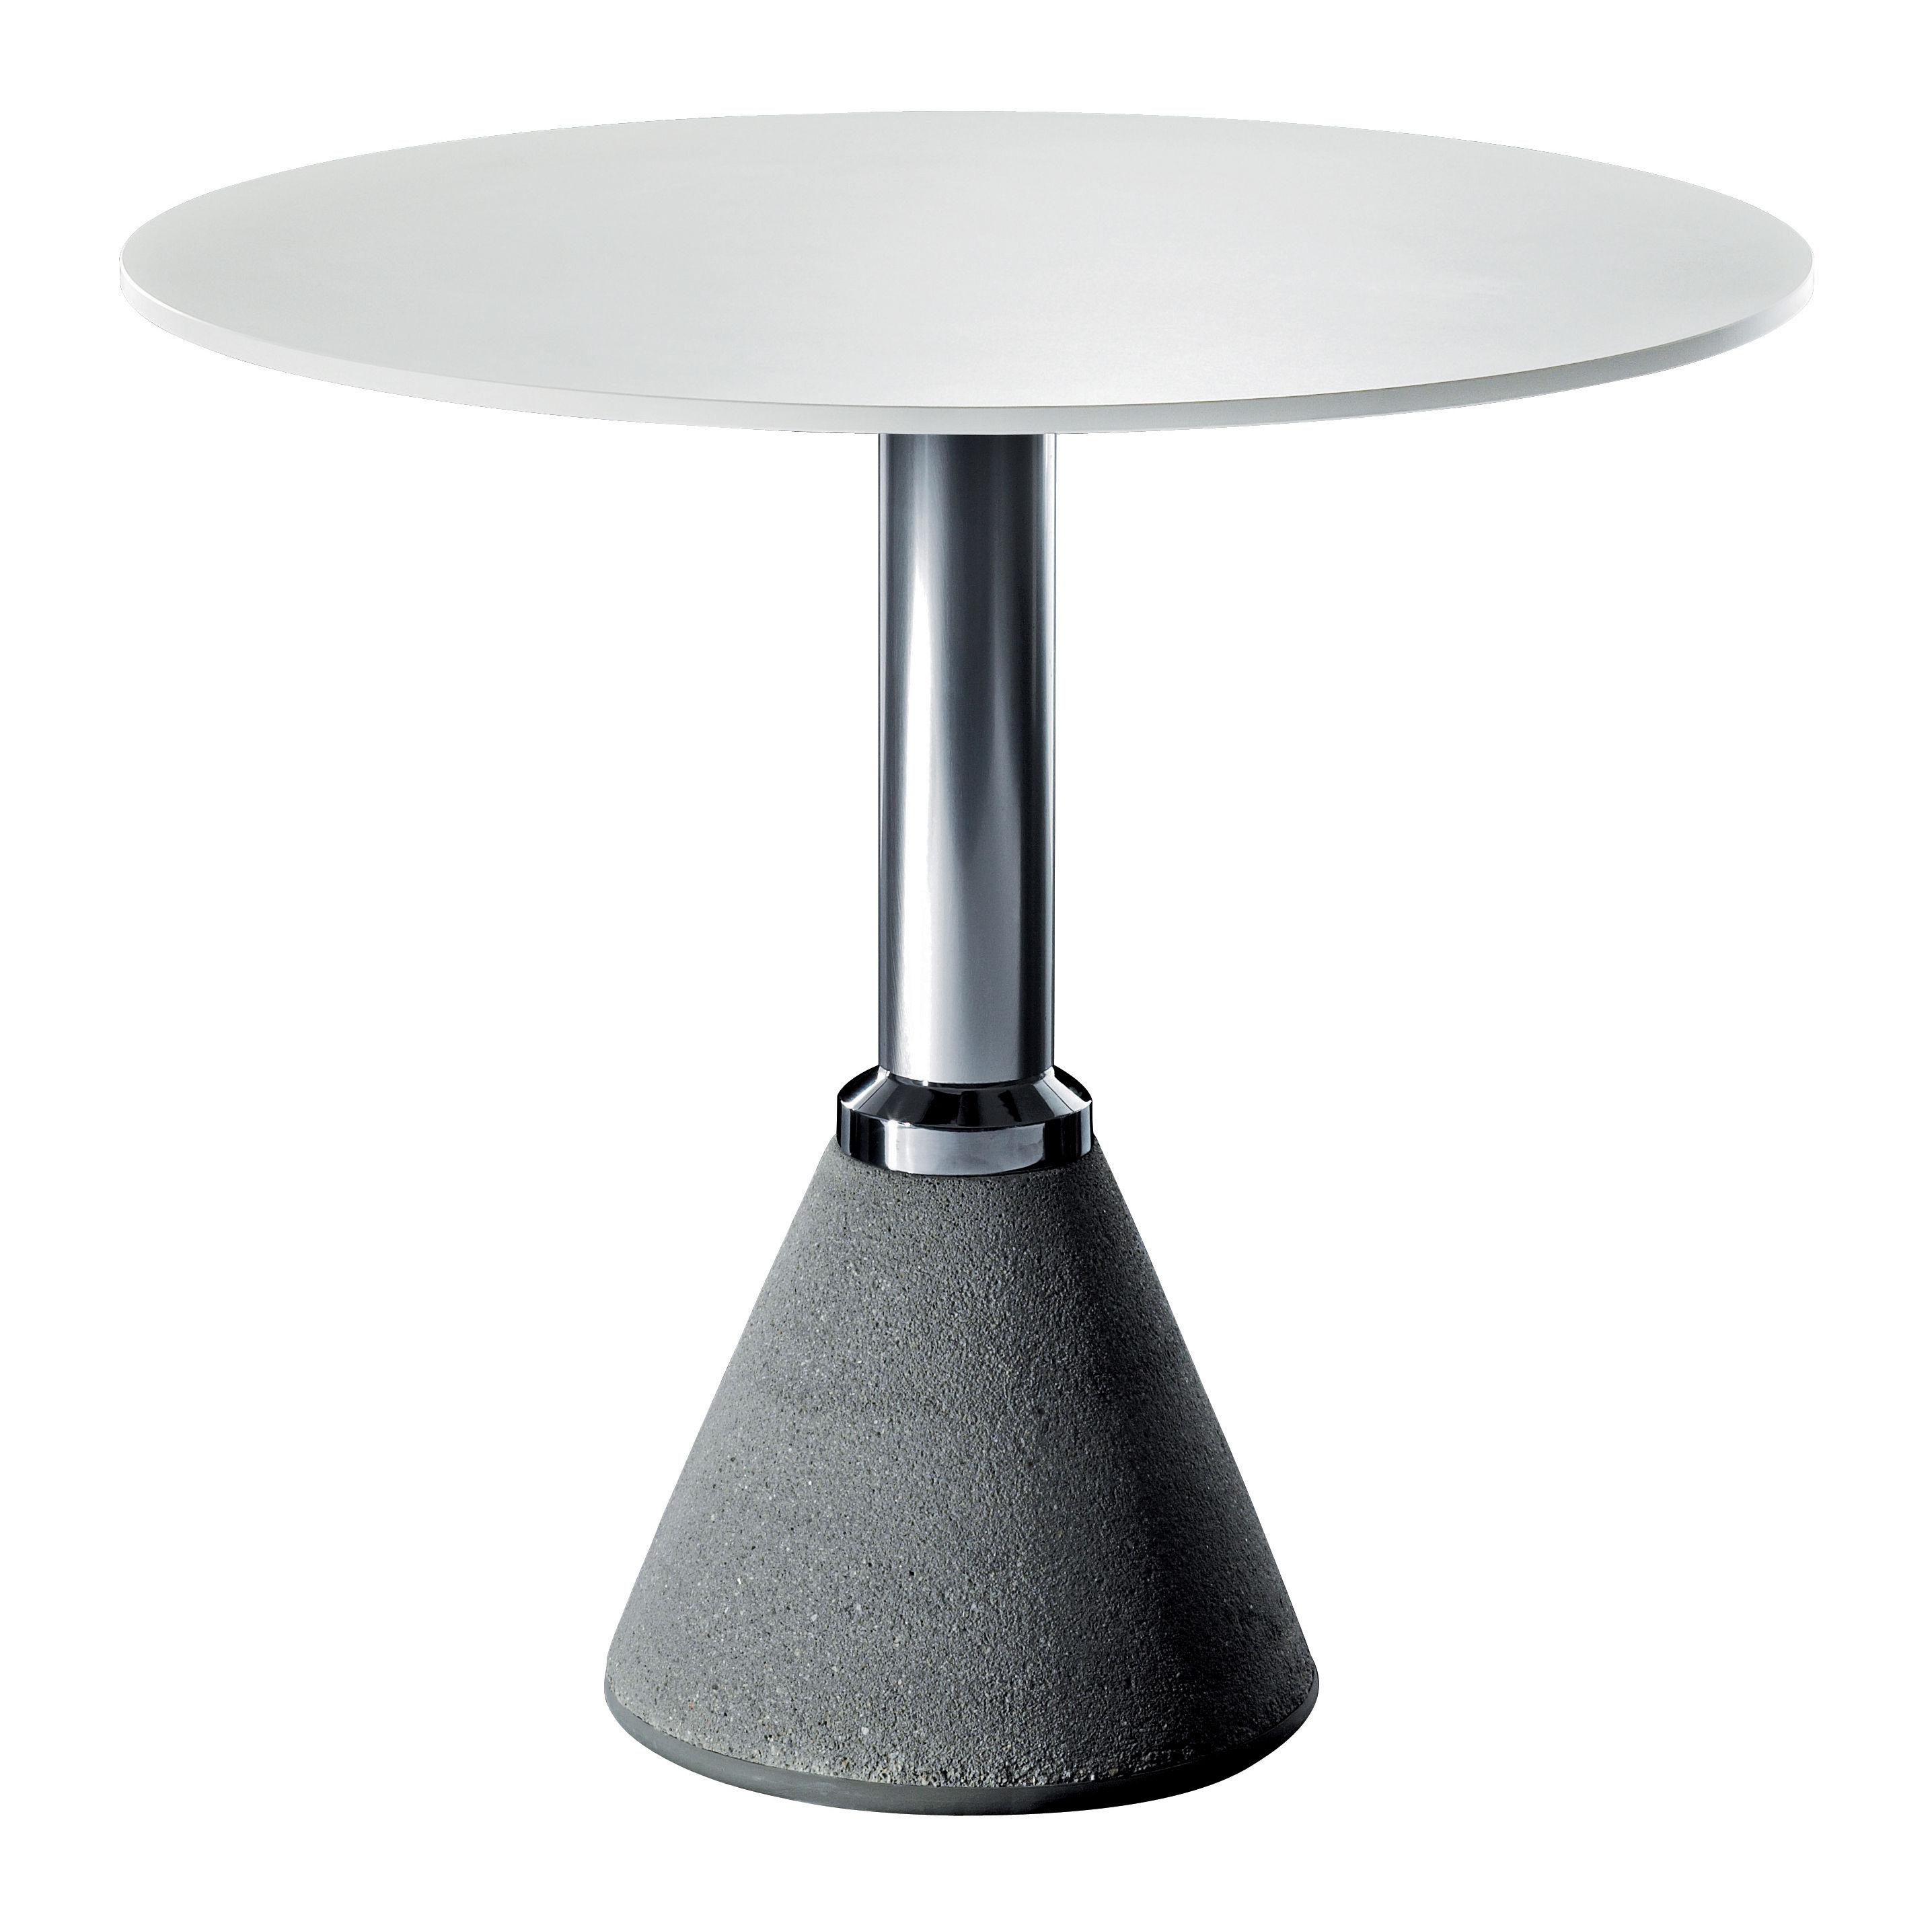 Outdoor - Garden Tables - One Bistrot Table ronde - Ø 79 cm by Magis - White Ø 79 cm - Aluminium, Concrete, HPL